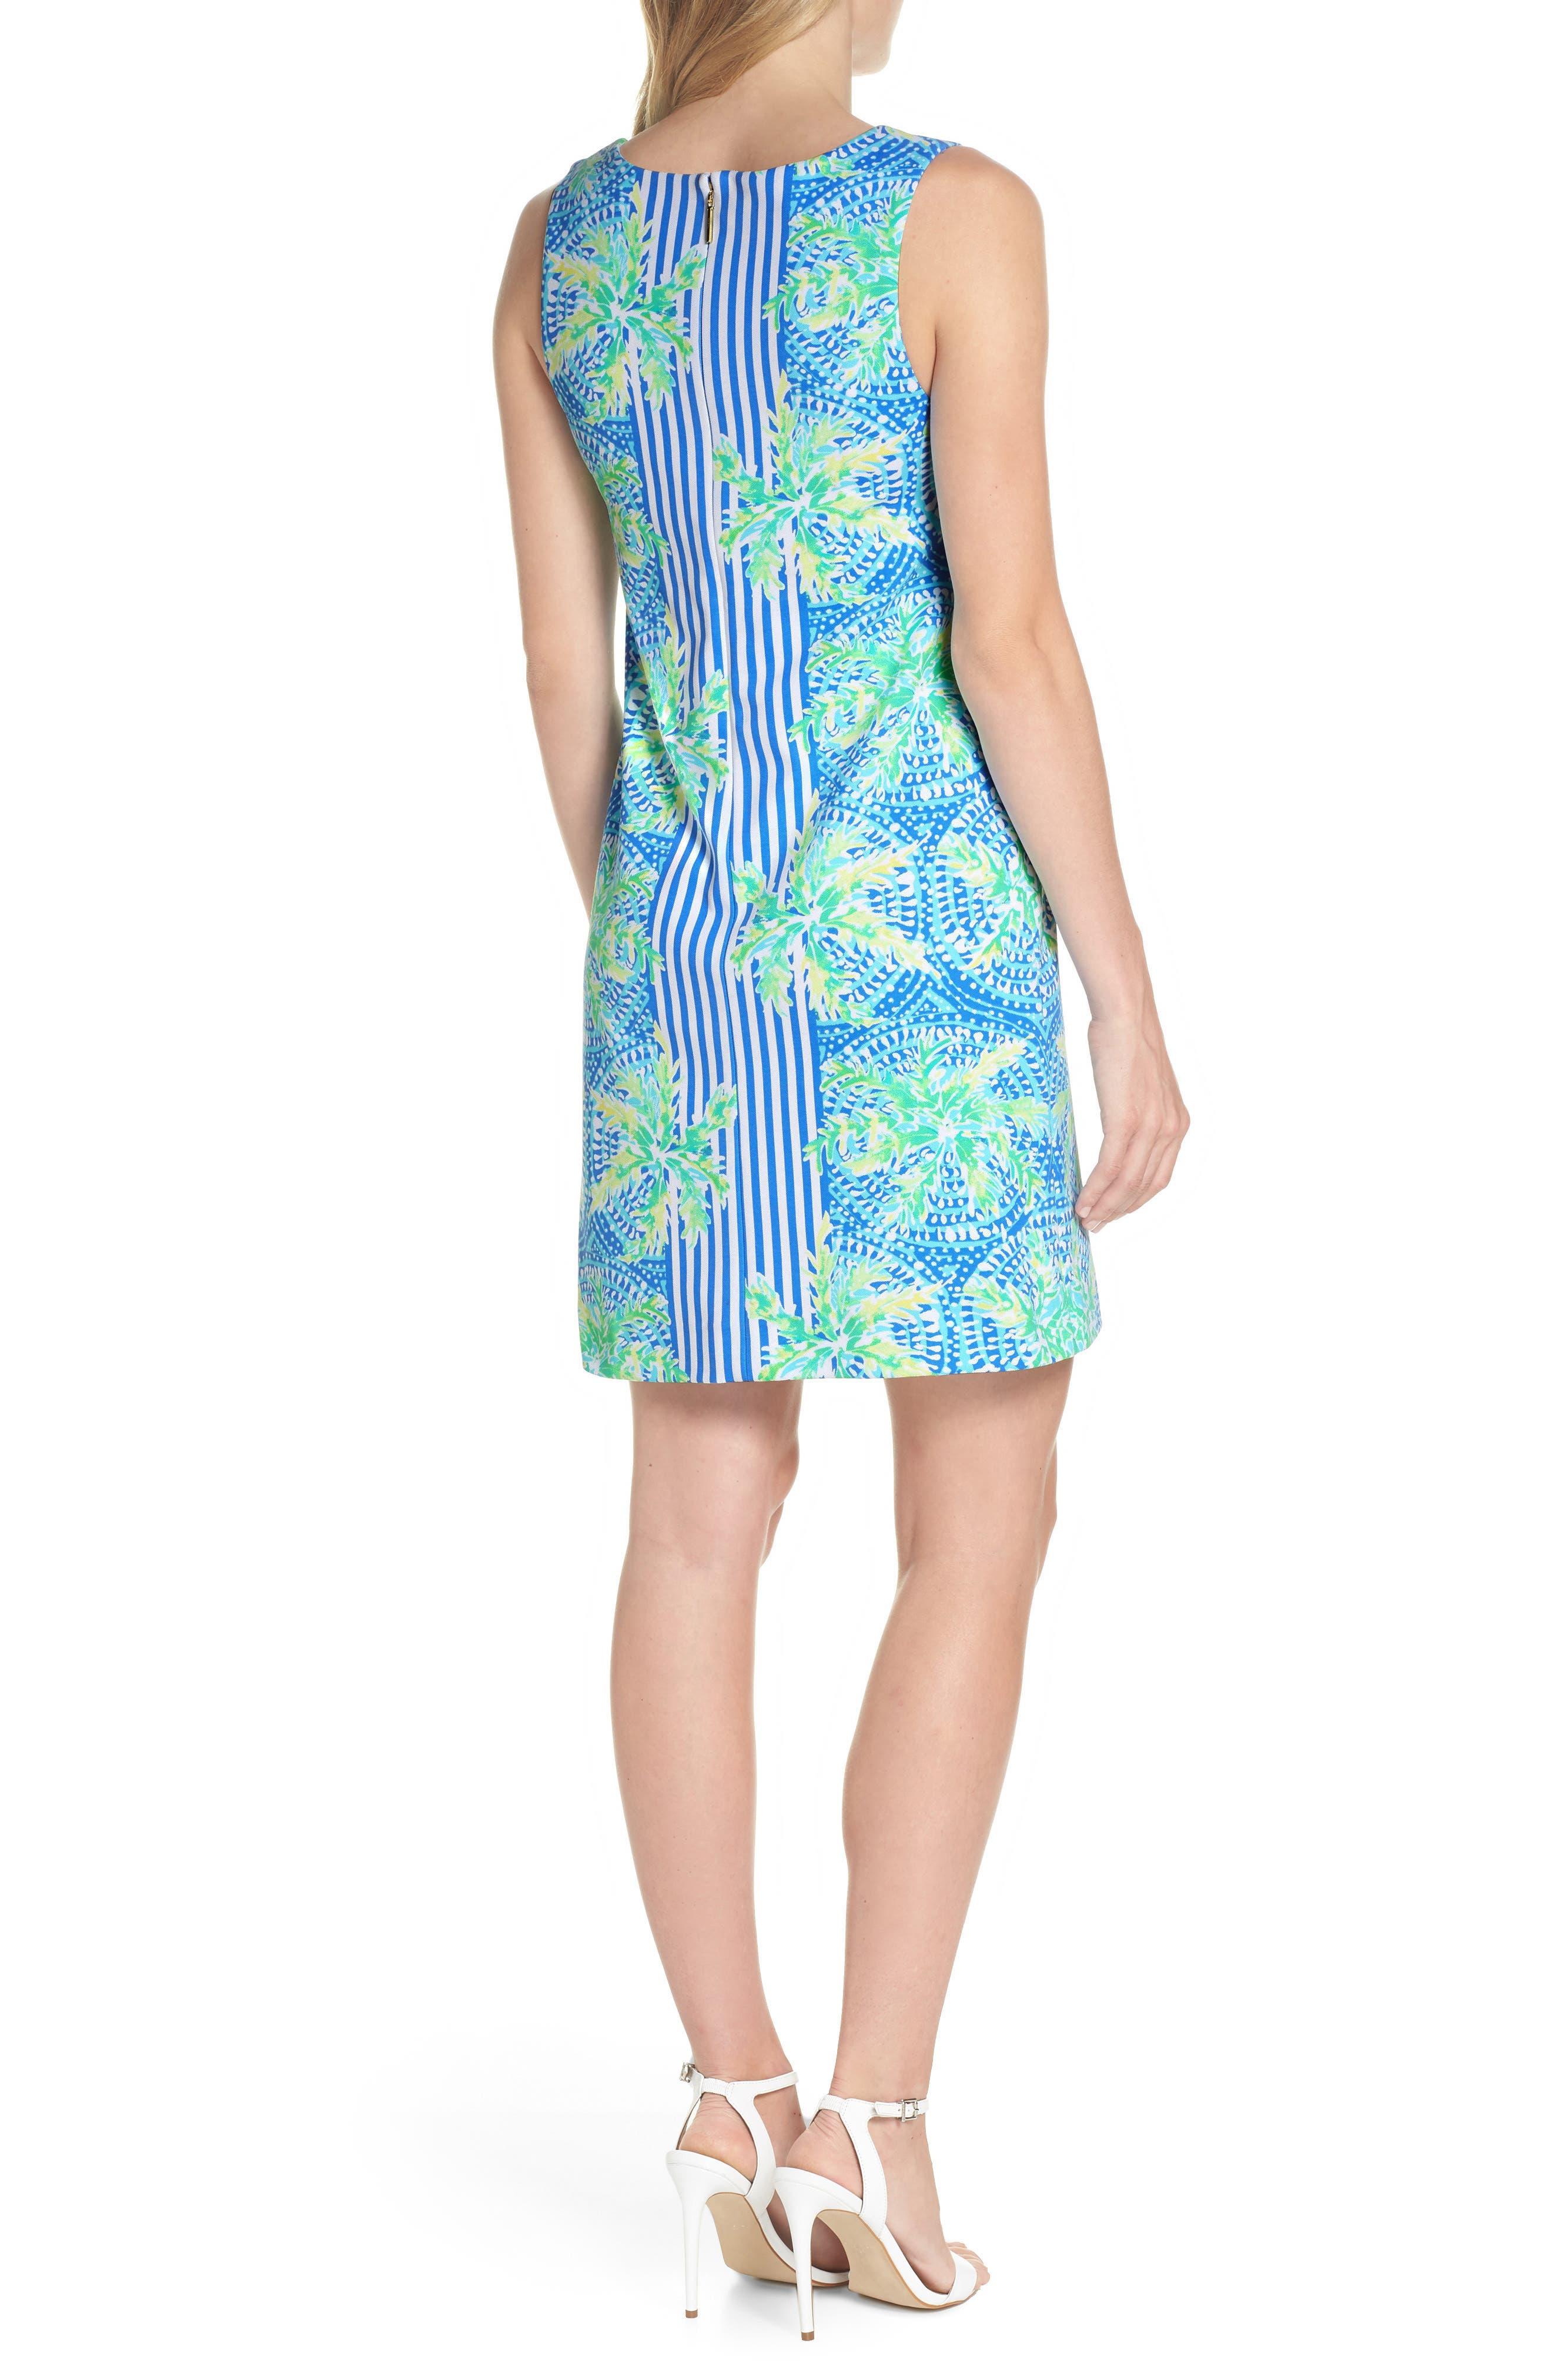 Chiara Stripe & Floral Print Dress,                             Alternate thumbnail 2, color,                             BENNET BLUE TROPIC LIKE ITS